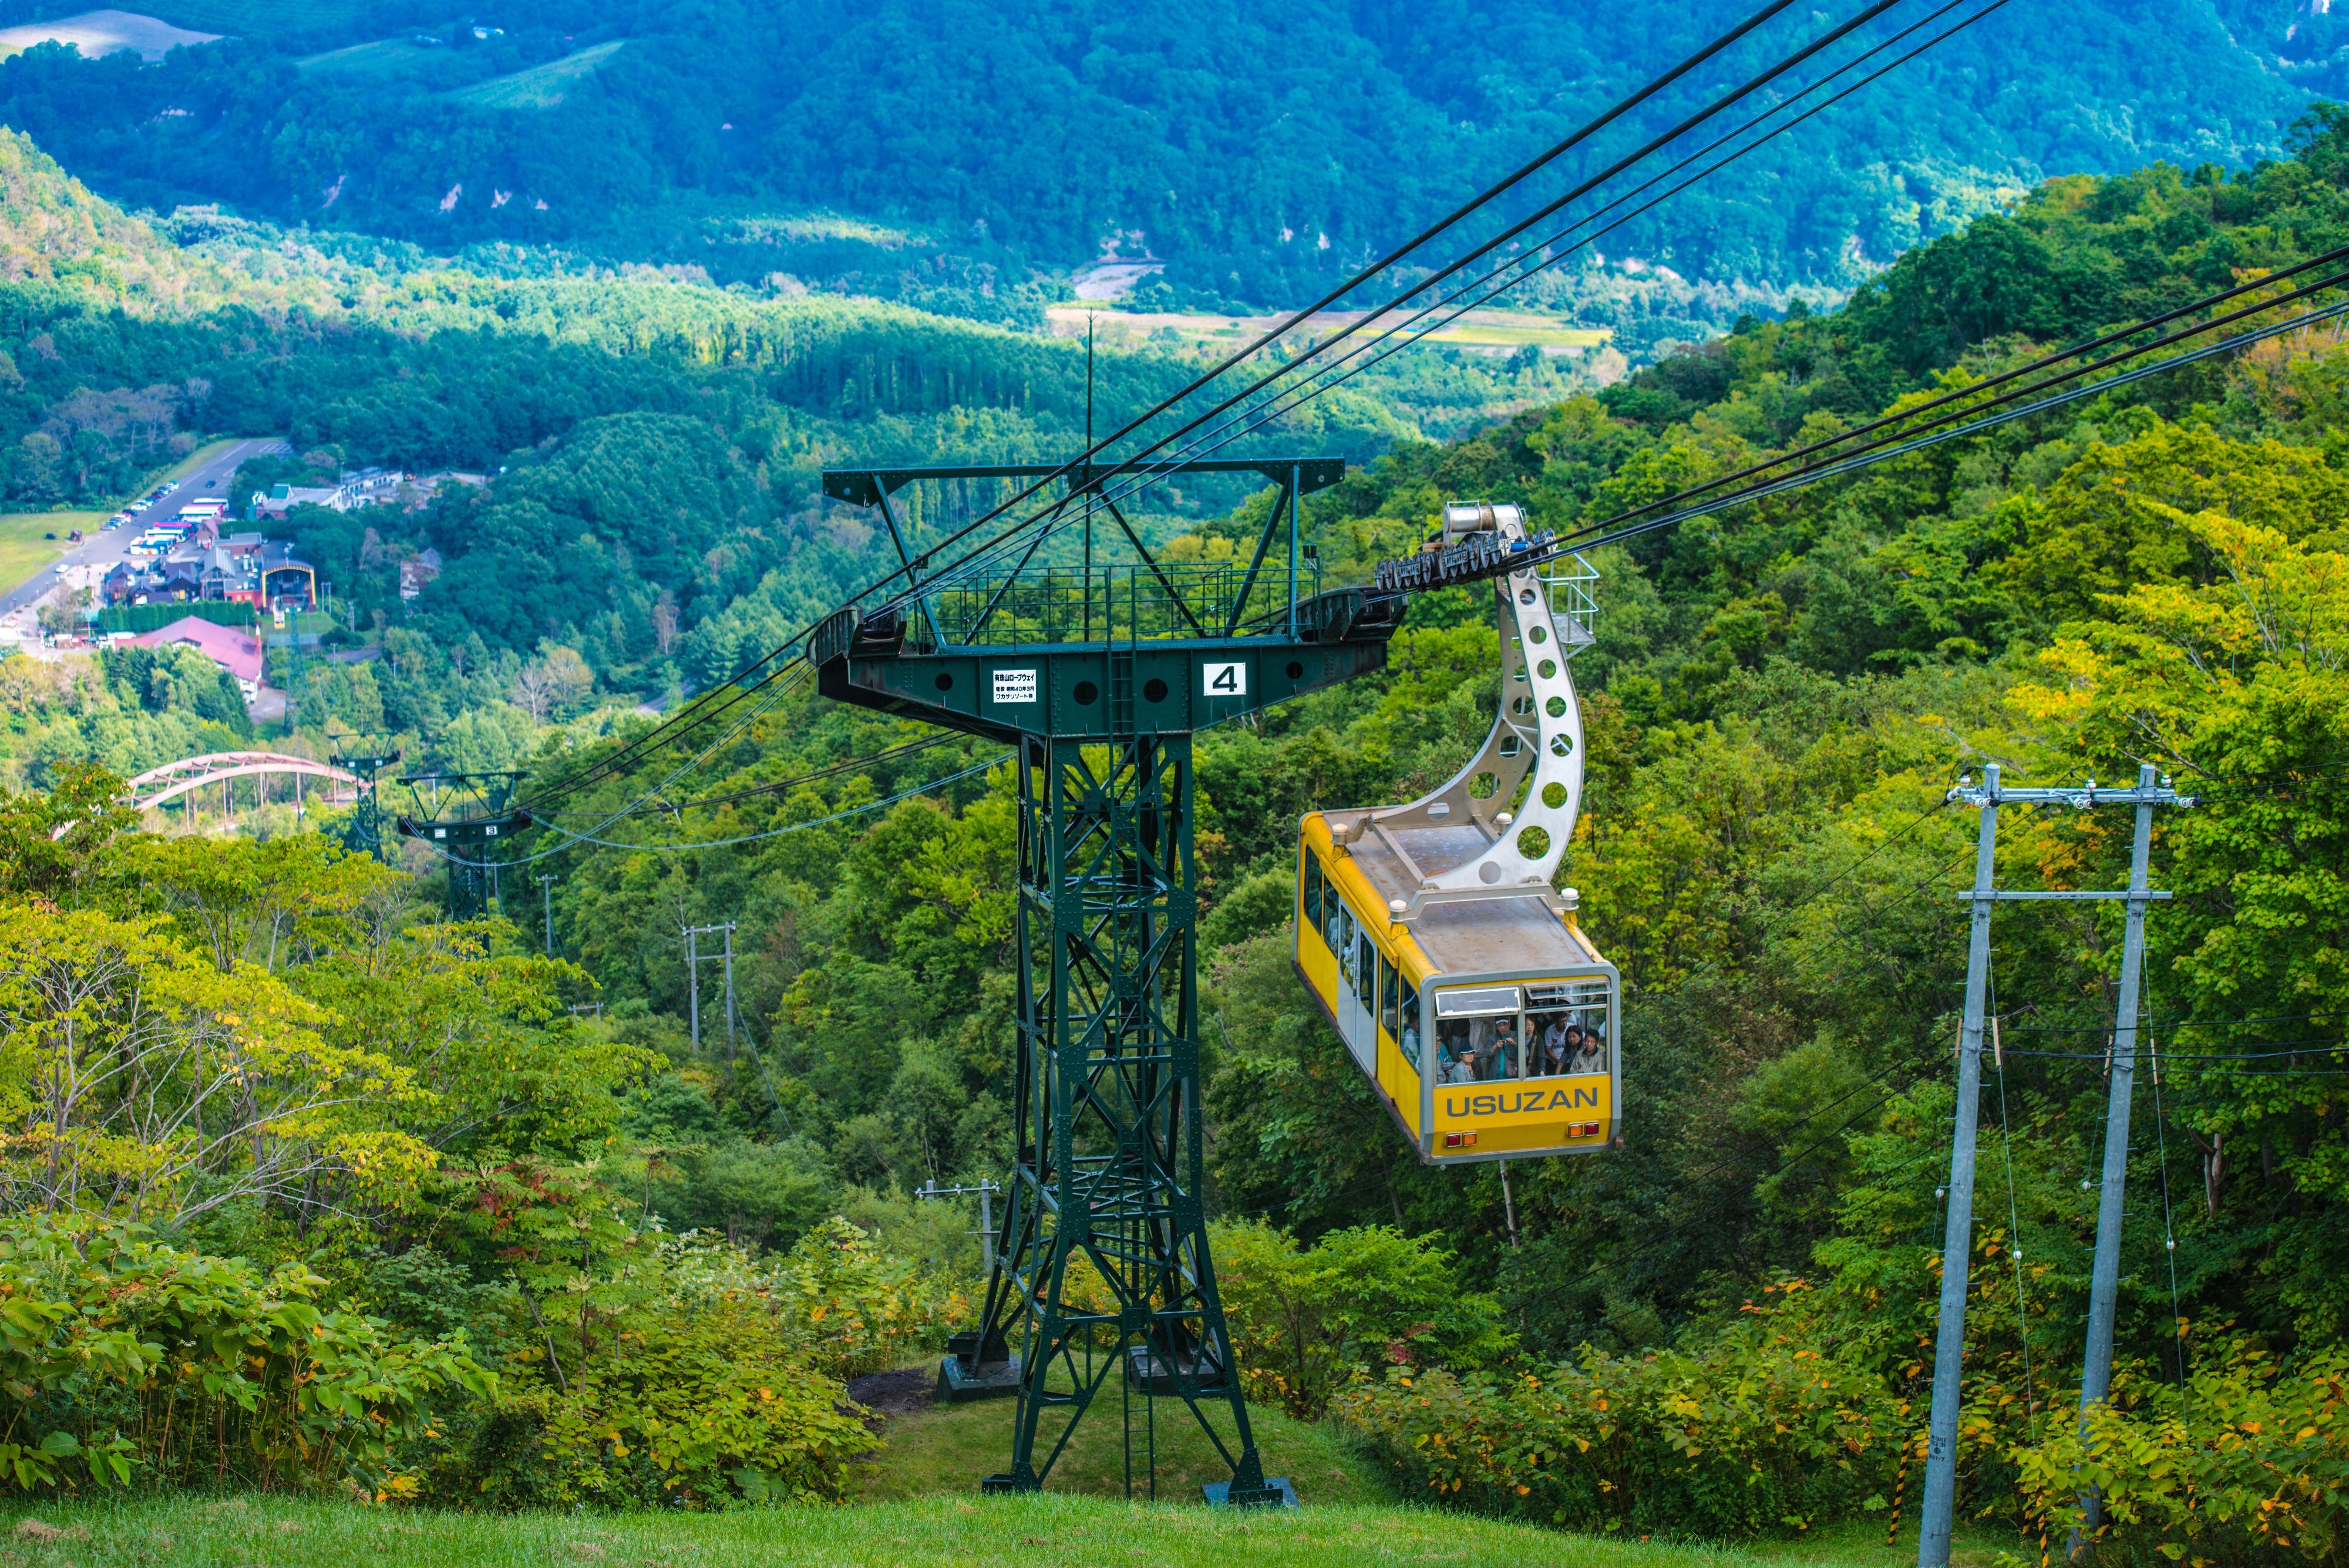 Usuzan Mountain Round Trip Cable Car Ticket